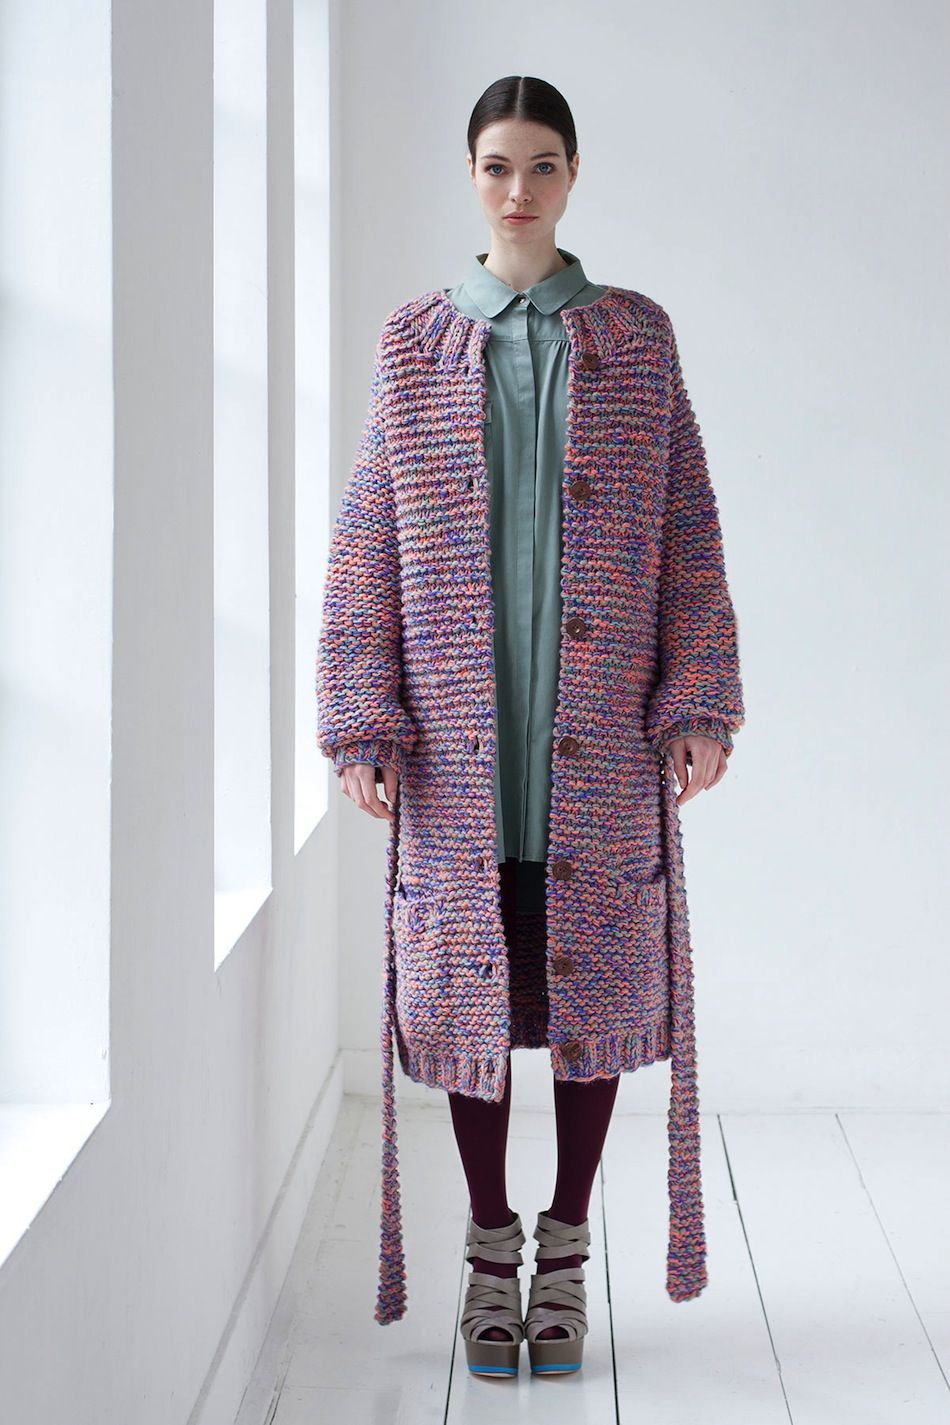 Studio JUX Fall Winter 2013 2014 | Knitts | Knitted coat